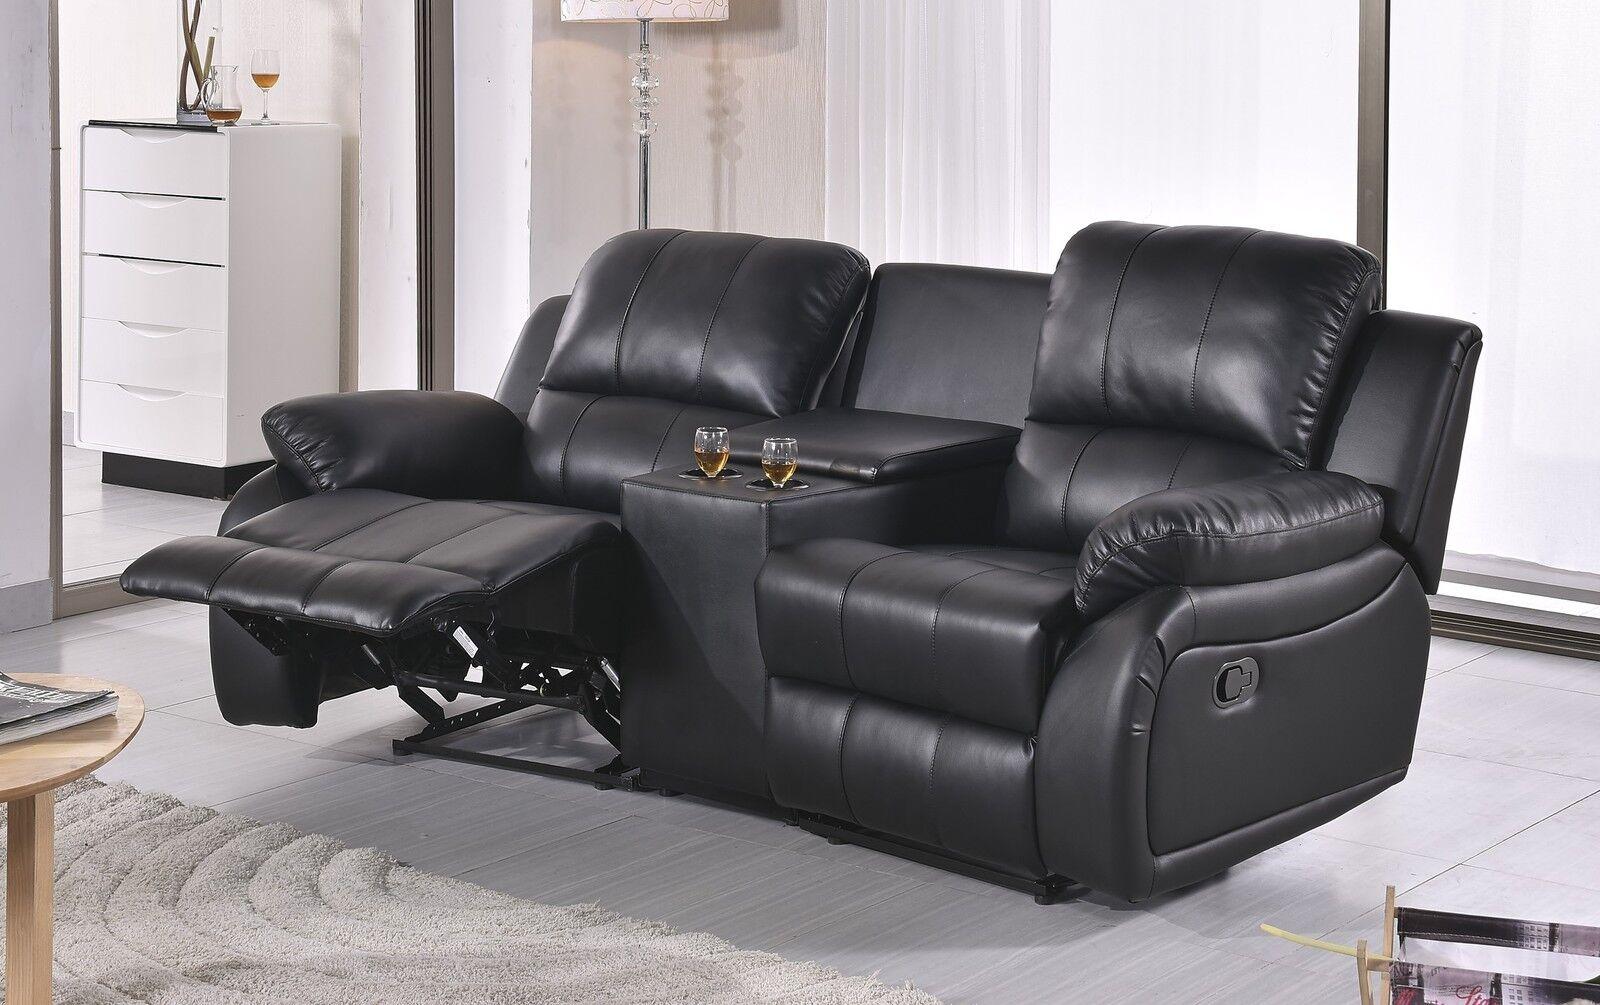 mikrofaser sofa kinosofa relaxcouch fernsehsofa heimkino 5129 cup 2 24 eur 899 00 picclick de. Black Bedroom Furniture Sets. Home Design Ideas